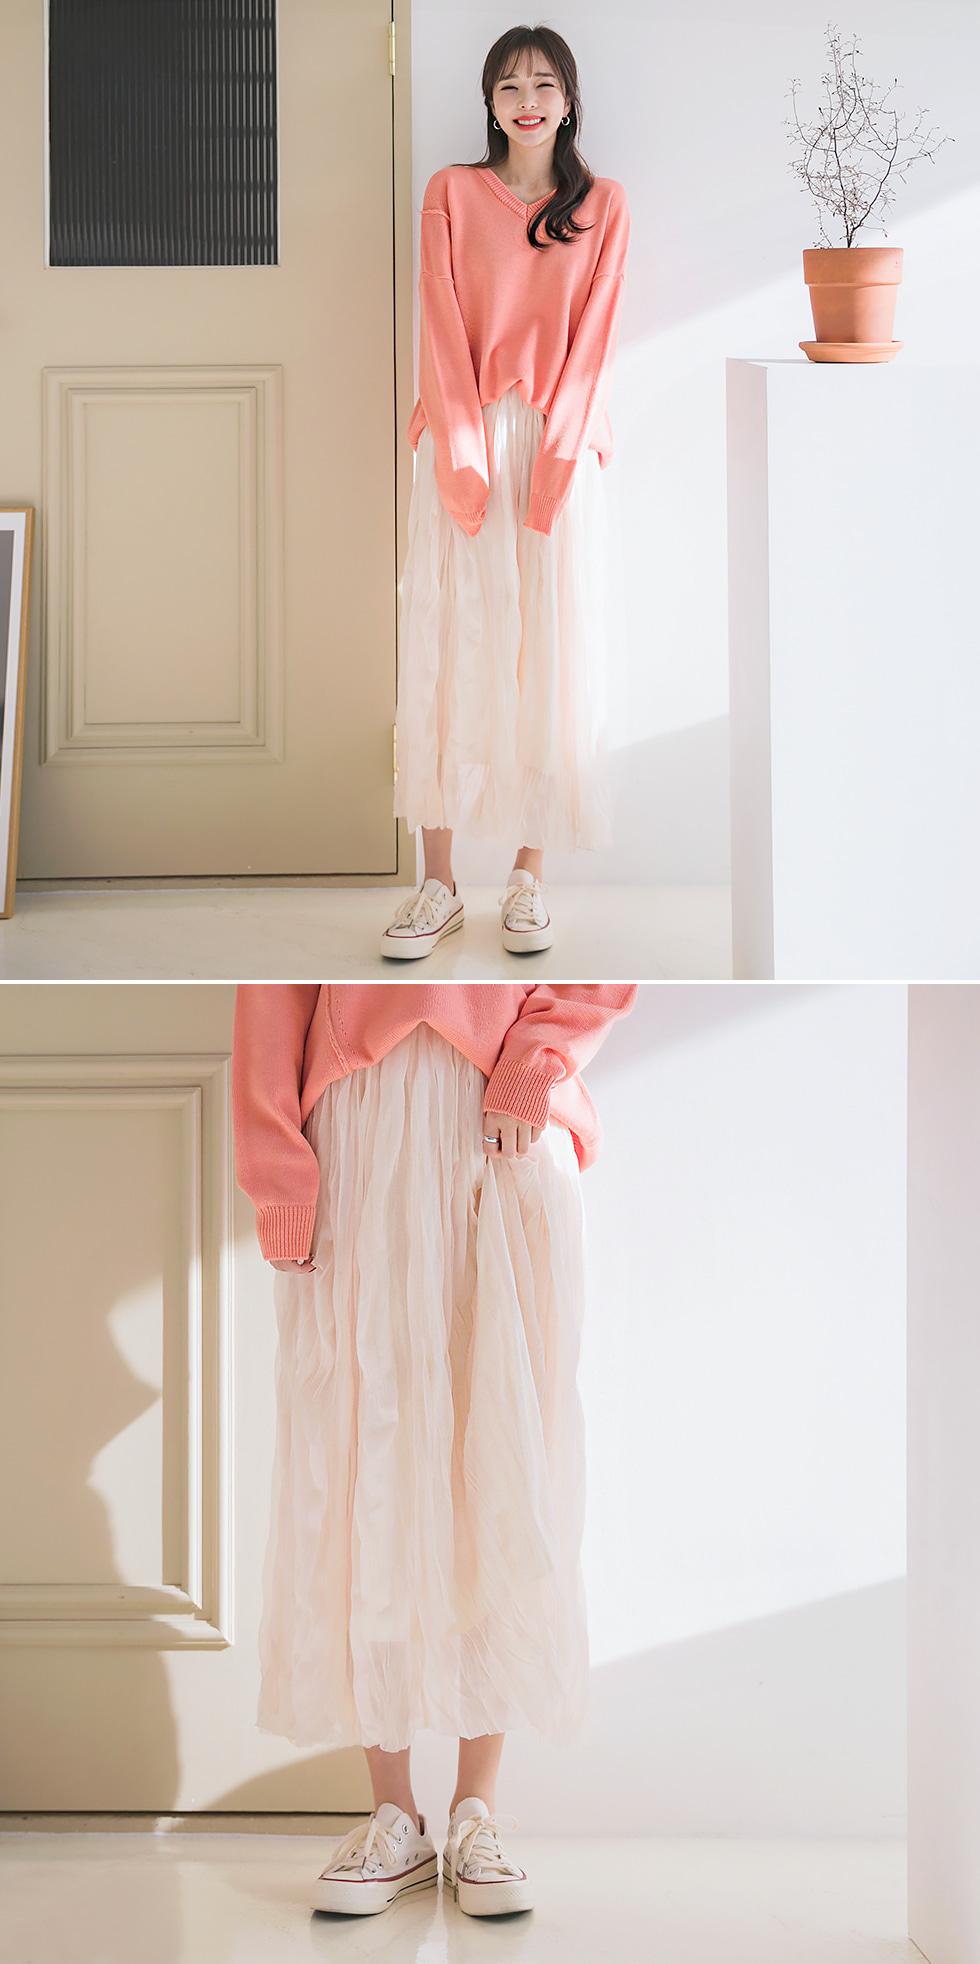 Shagglumming skirt